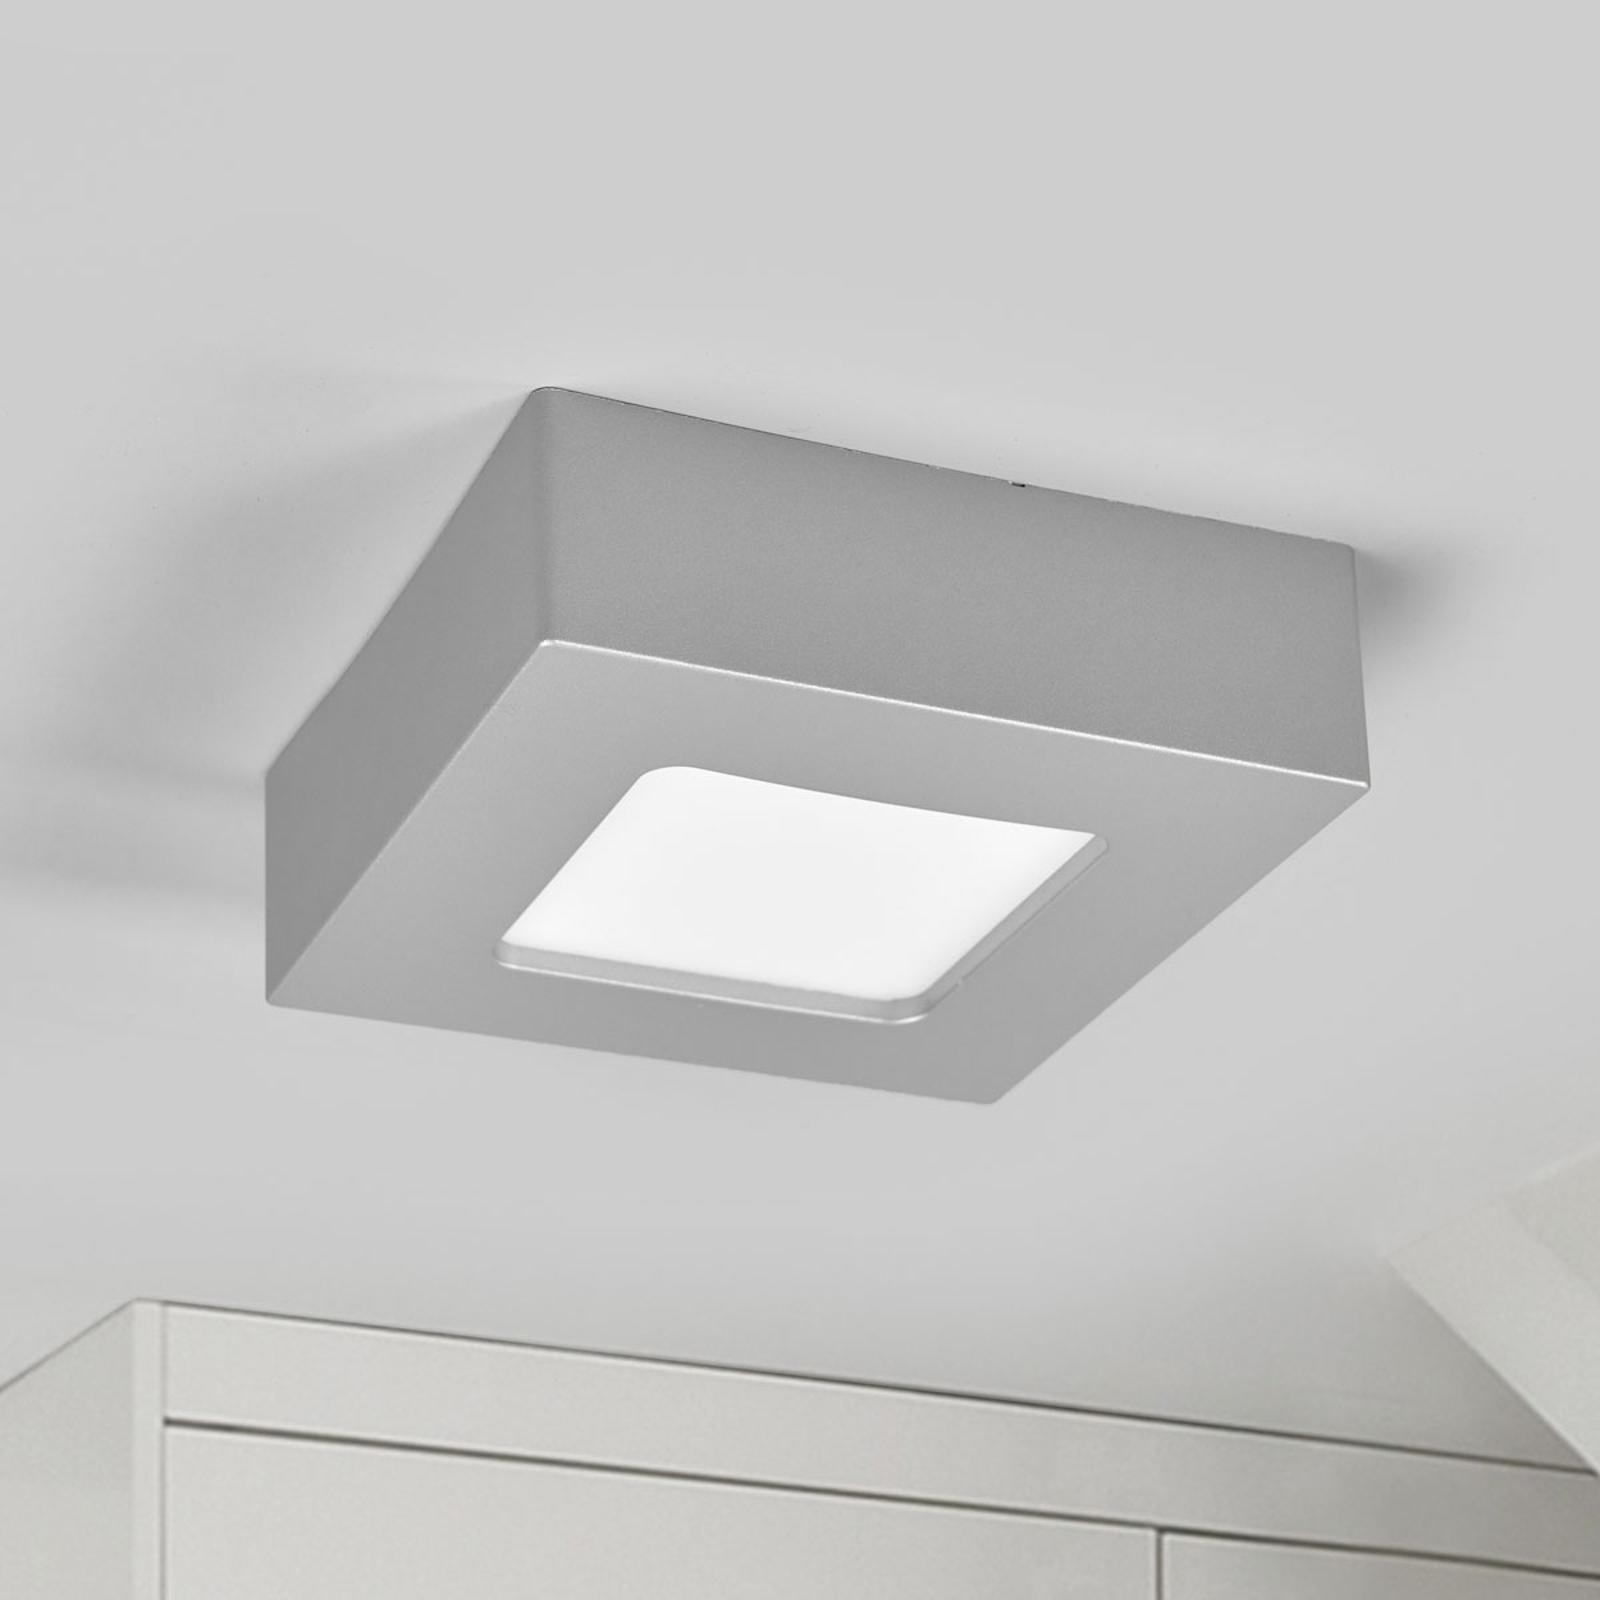 Lampa LED Marlo srebrna 3000K kątowa 12,8cm